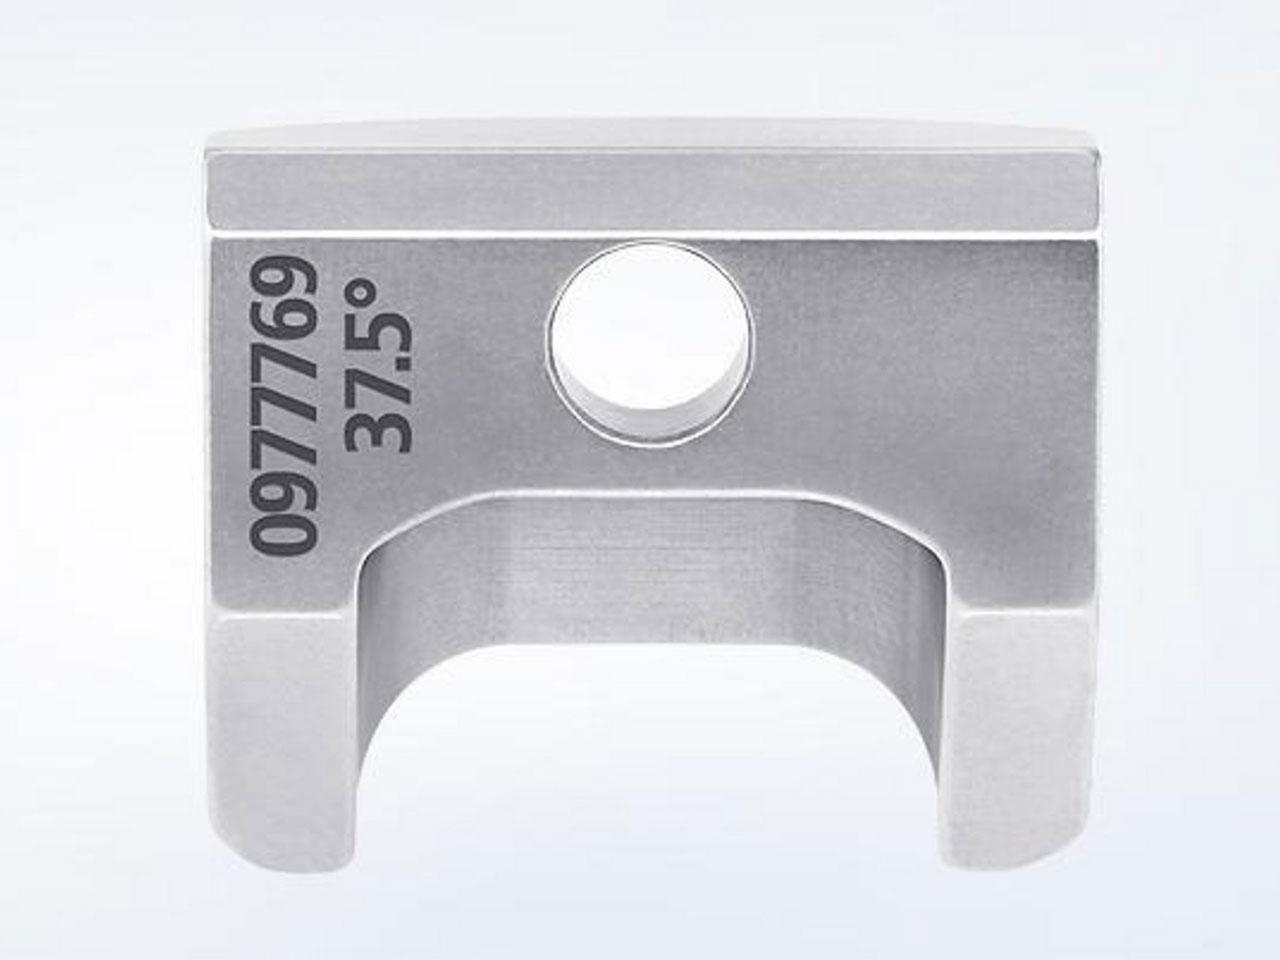 Schweisskantenformer TKF 700 Gegenhalter 37,5°